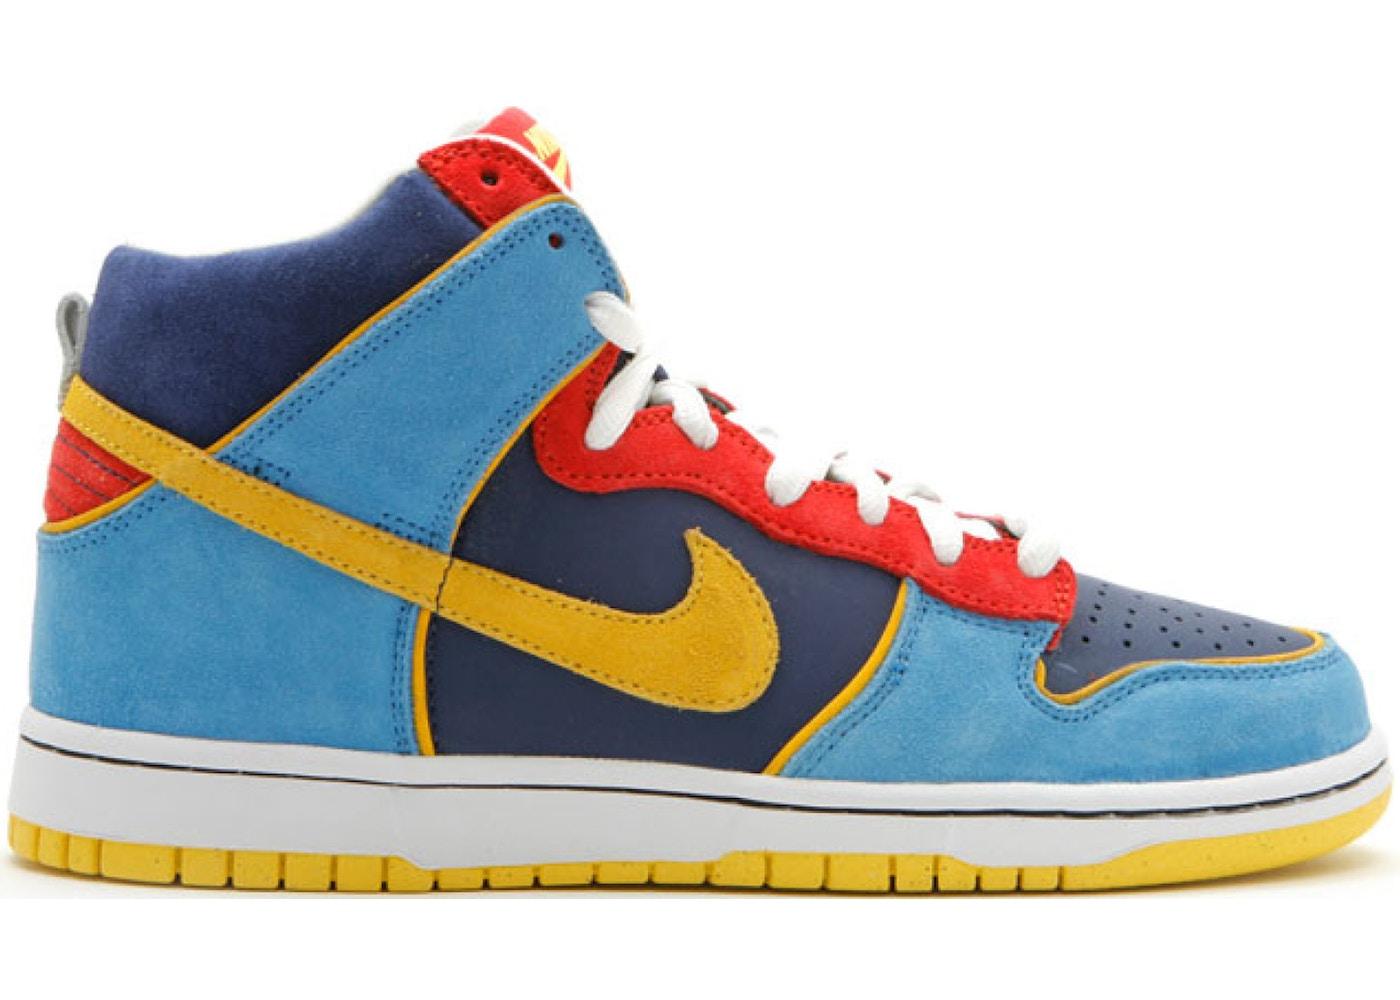 buy online e67bf e73a9 Nike SB Dunk High Pacman - 305050-471